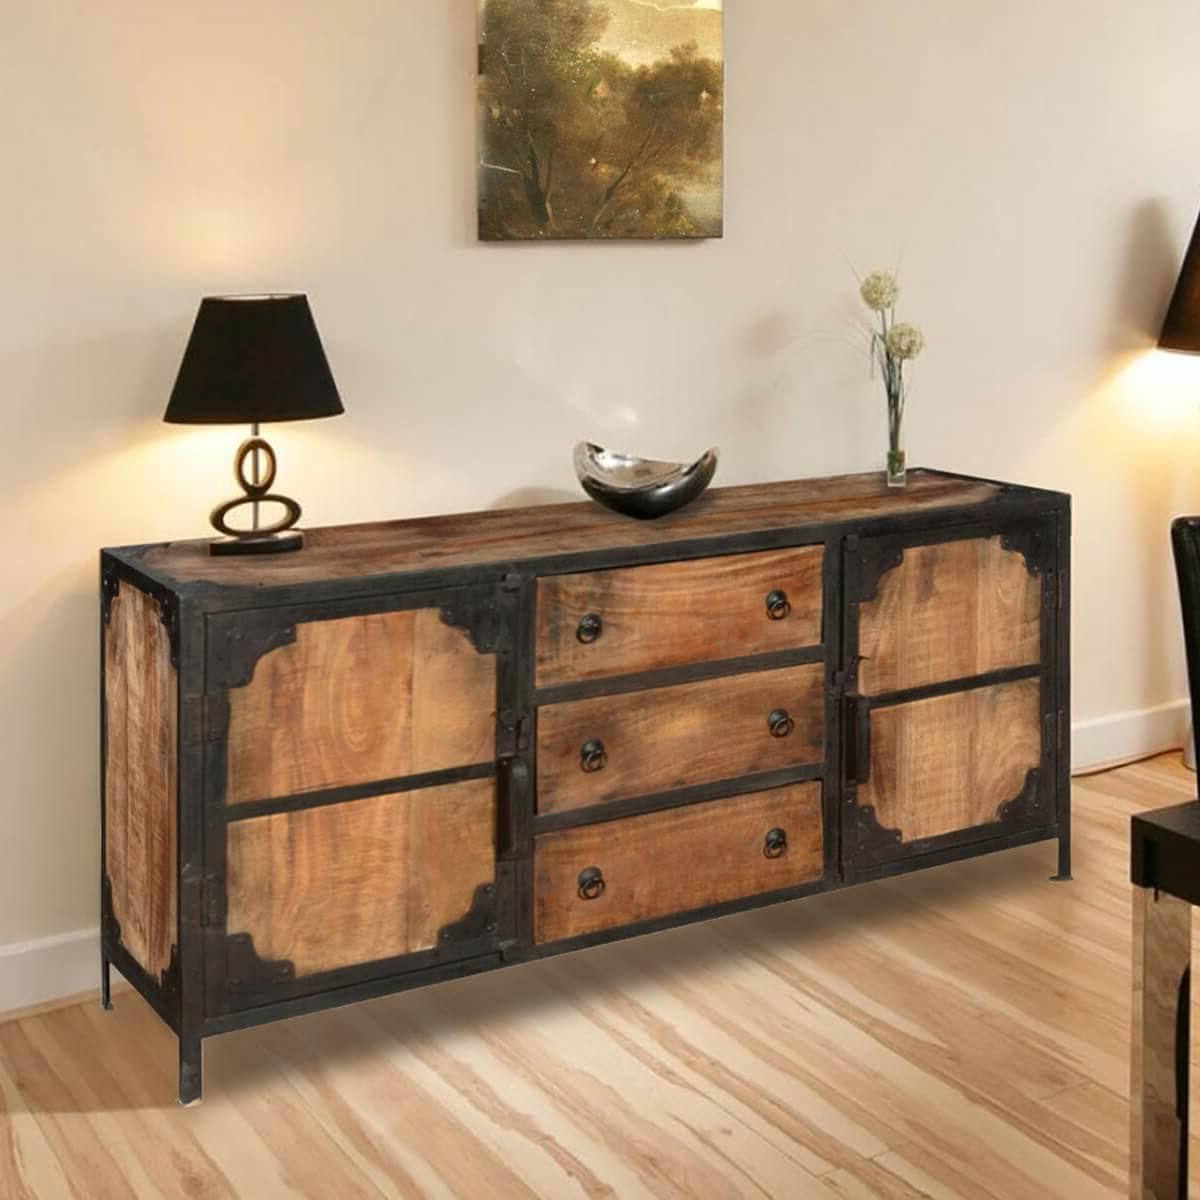 Industrial 3 Drawer 3 Door Sideboards Pertaining To Most Current Windsor Solid Wood & Iron 3 Drawer & 2 Door Industrial Buffet Cabinet (Gallery 6 of 20)